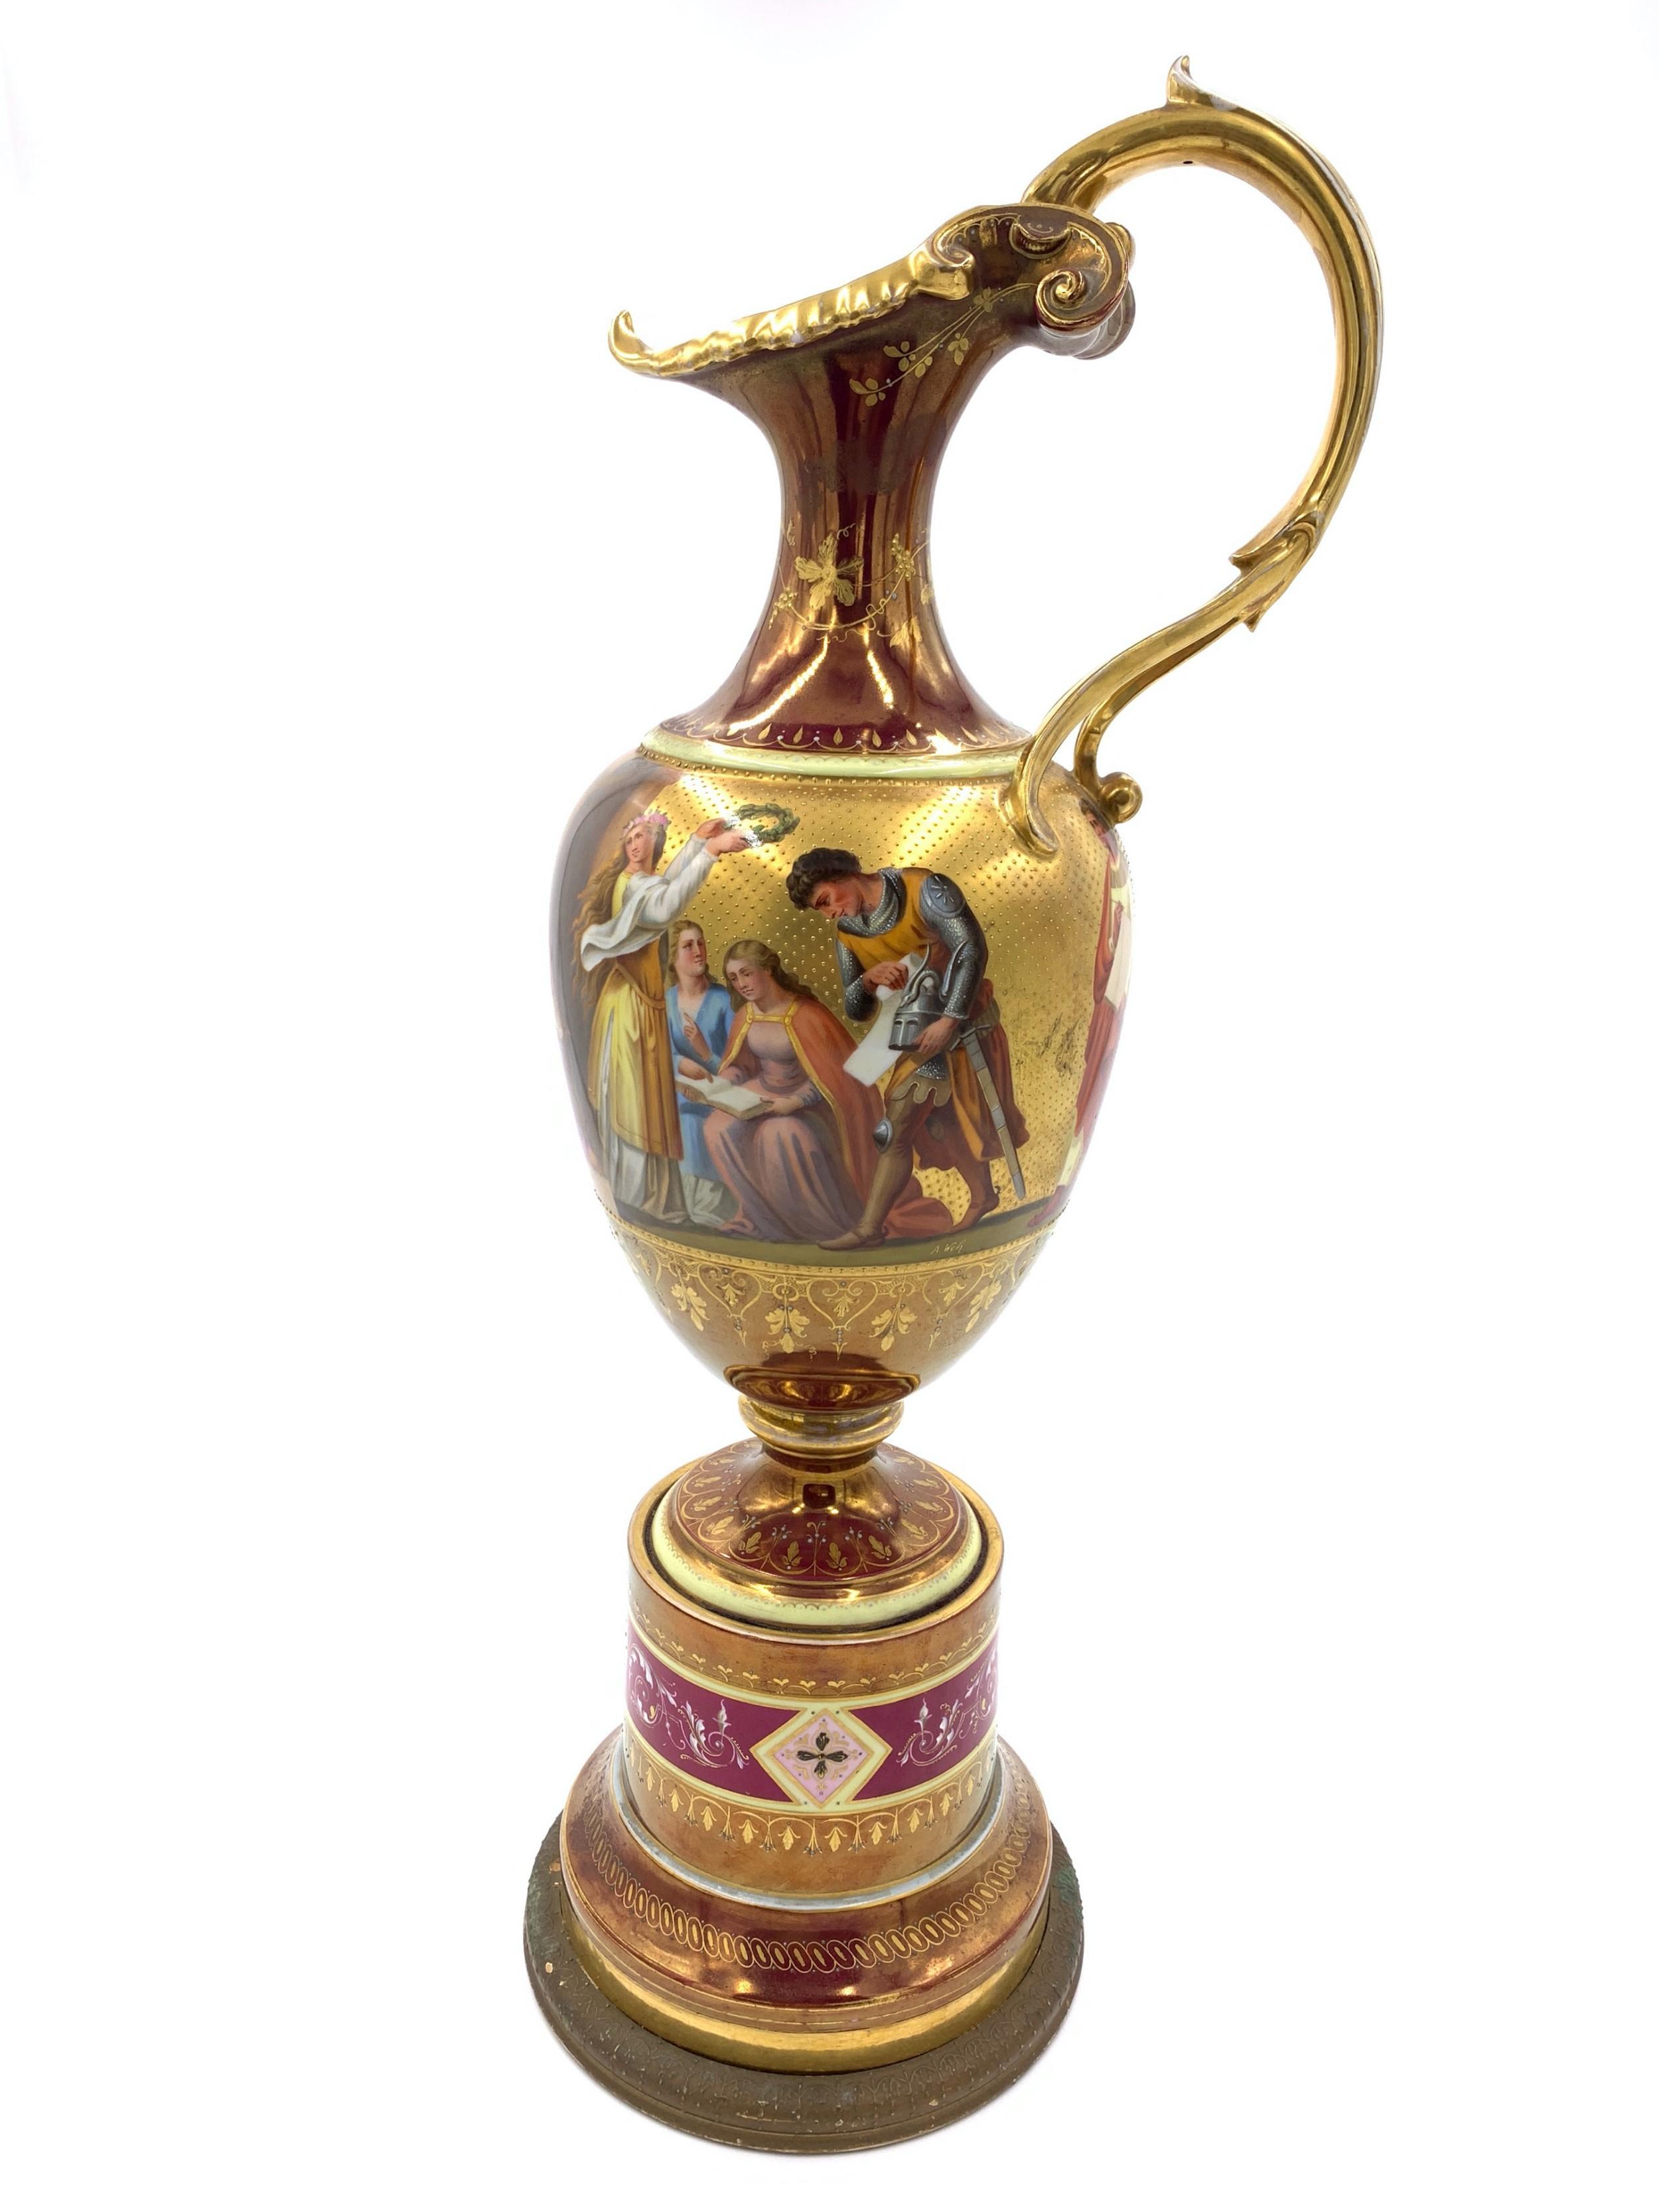 large royal vienna porcelain ewer on stand